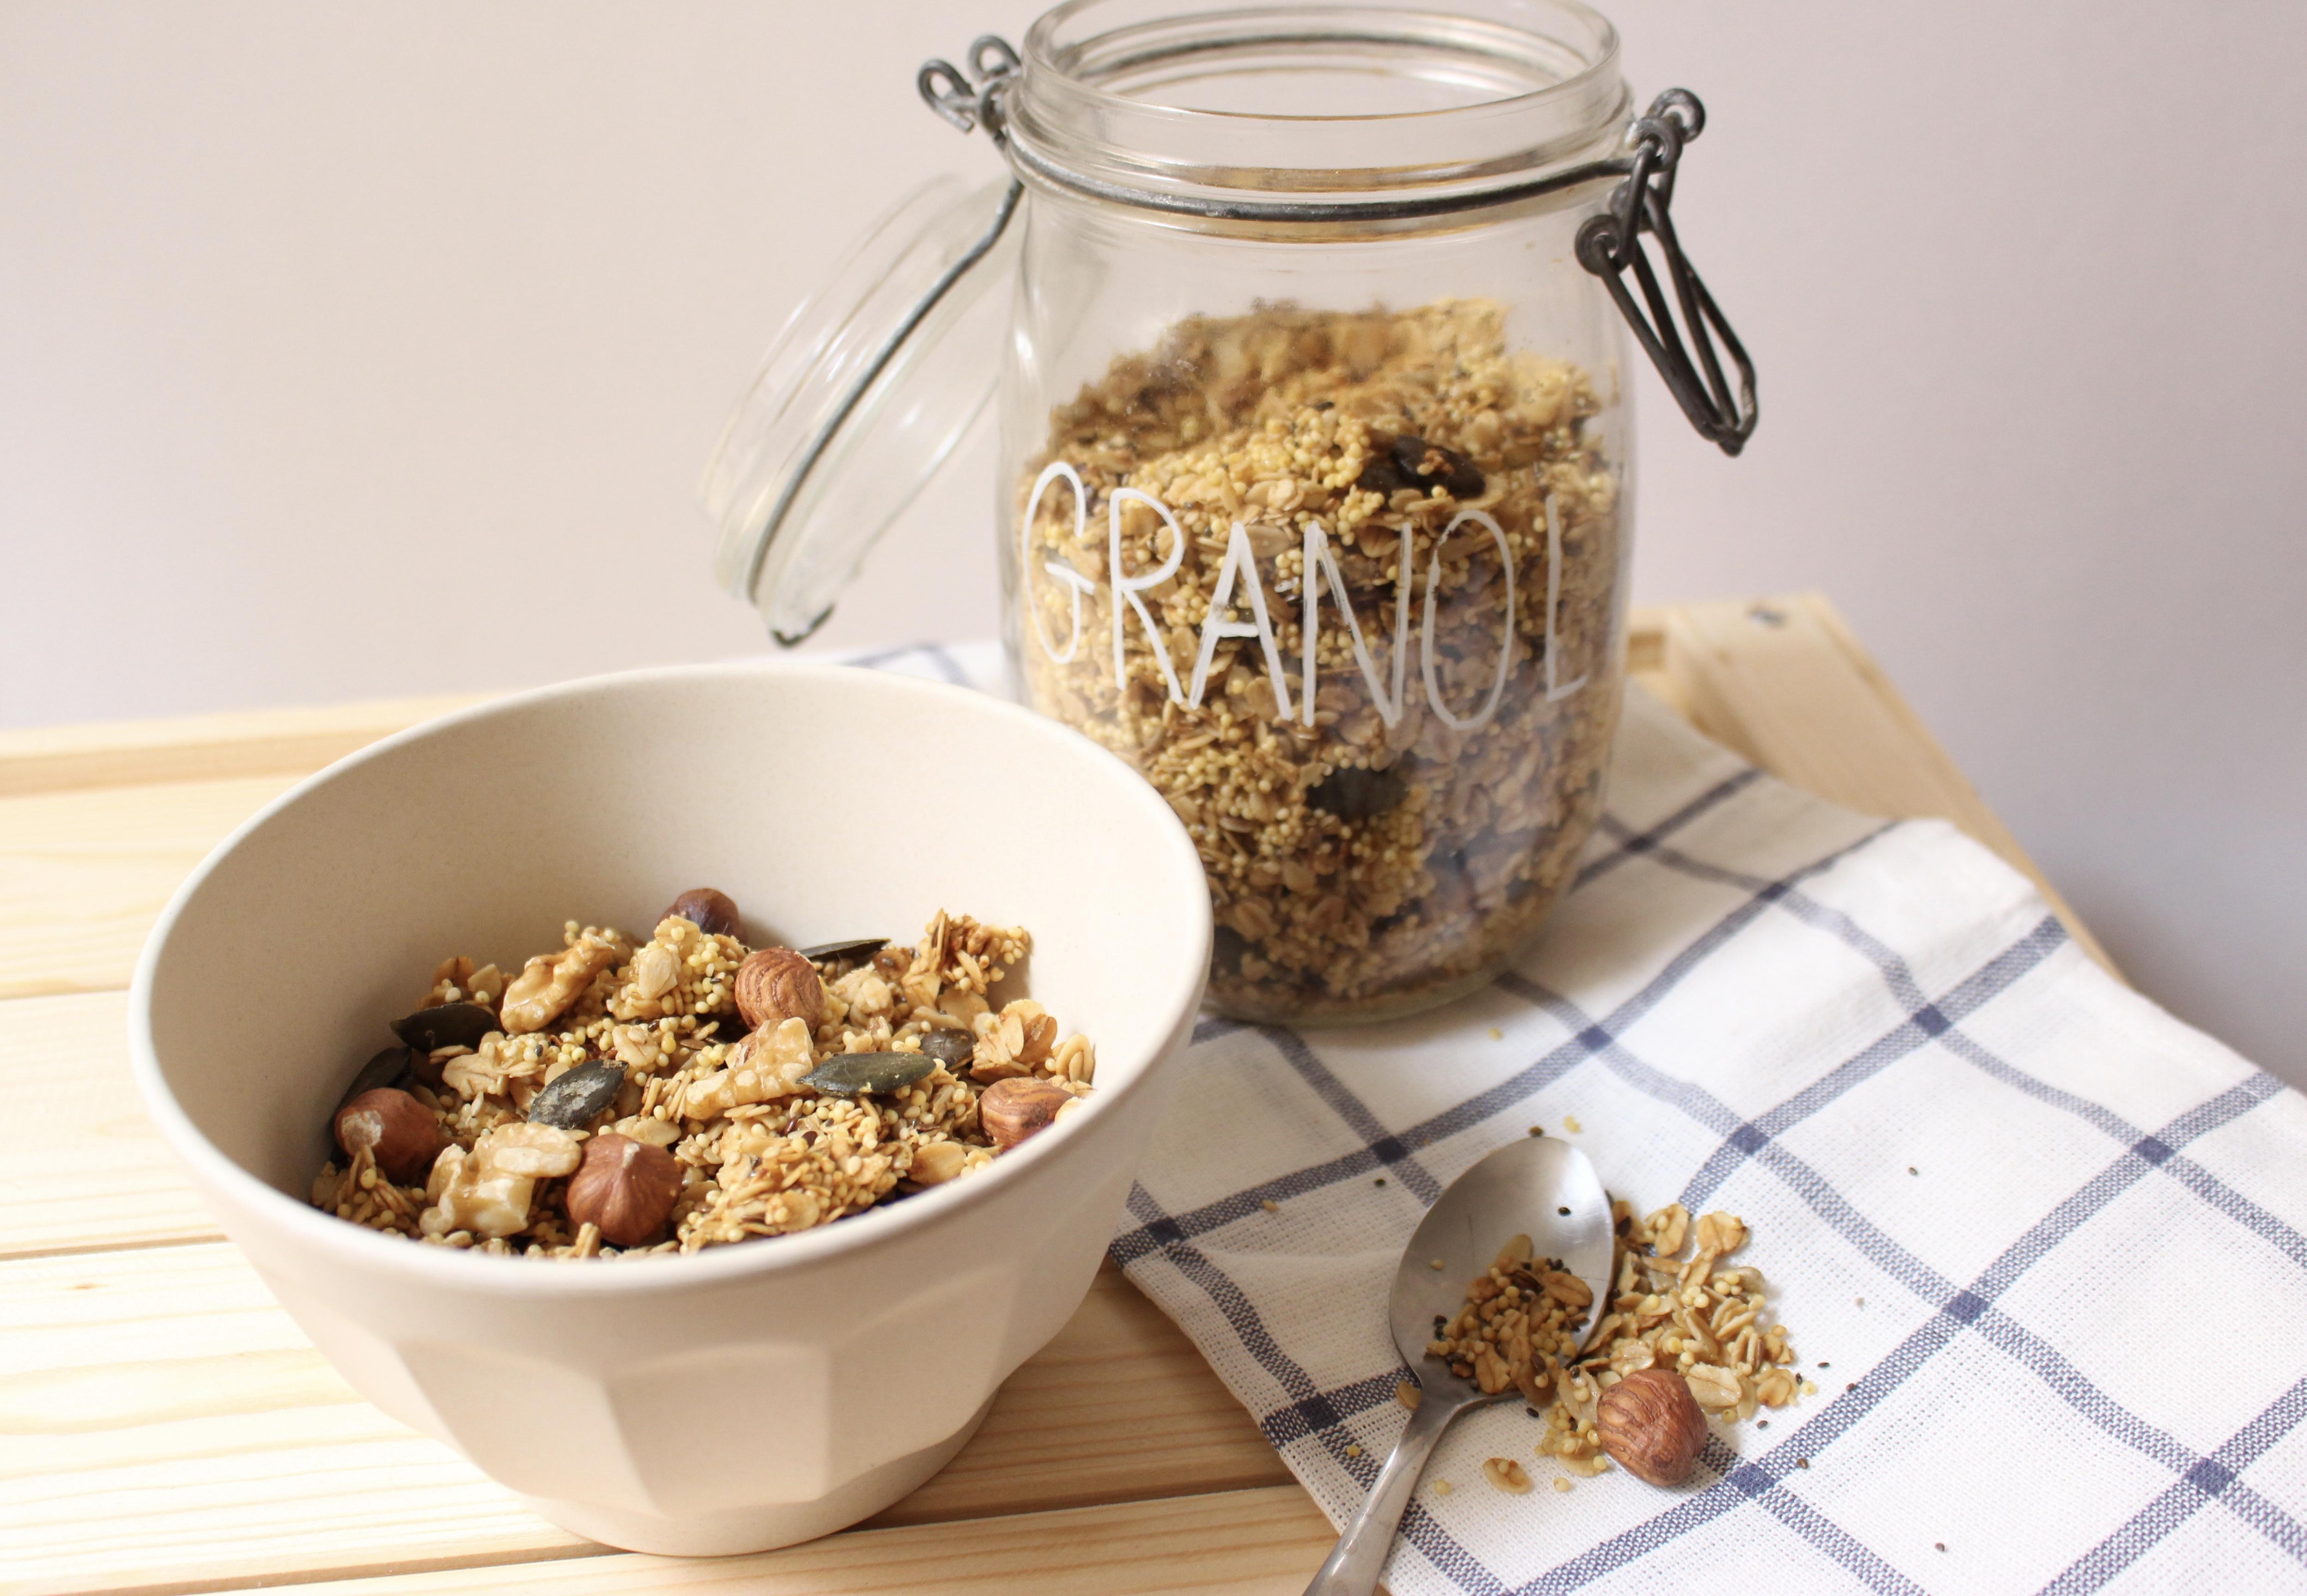 Recette de granola vegan, sain et gourmand